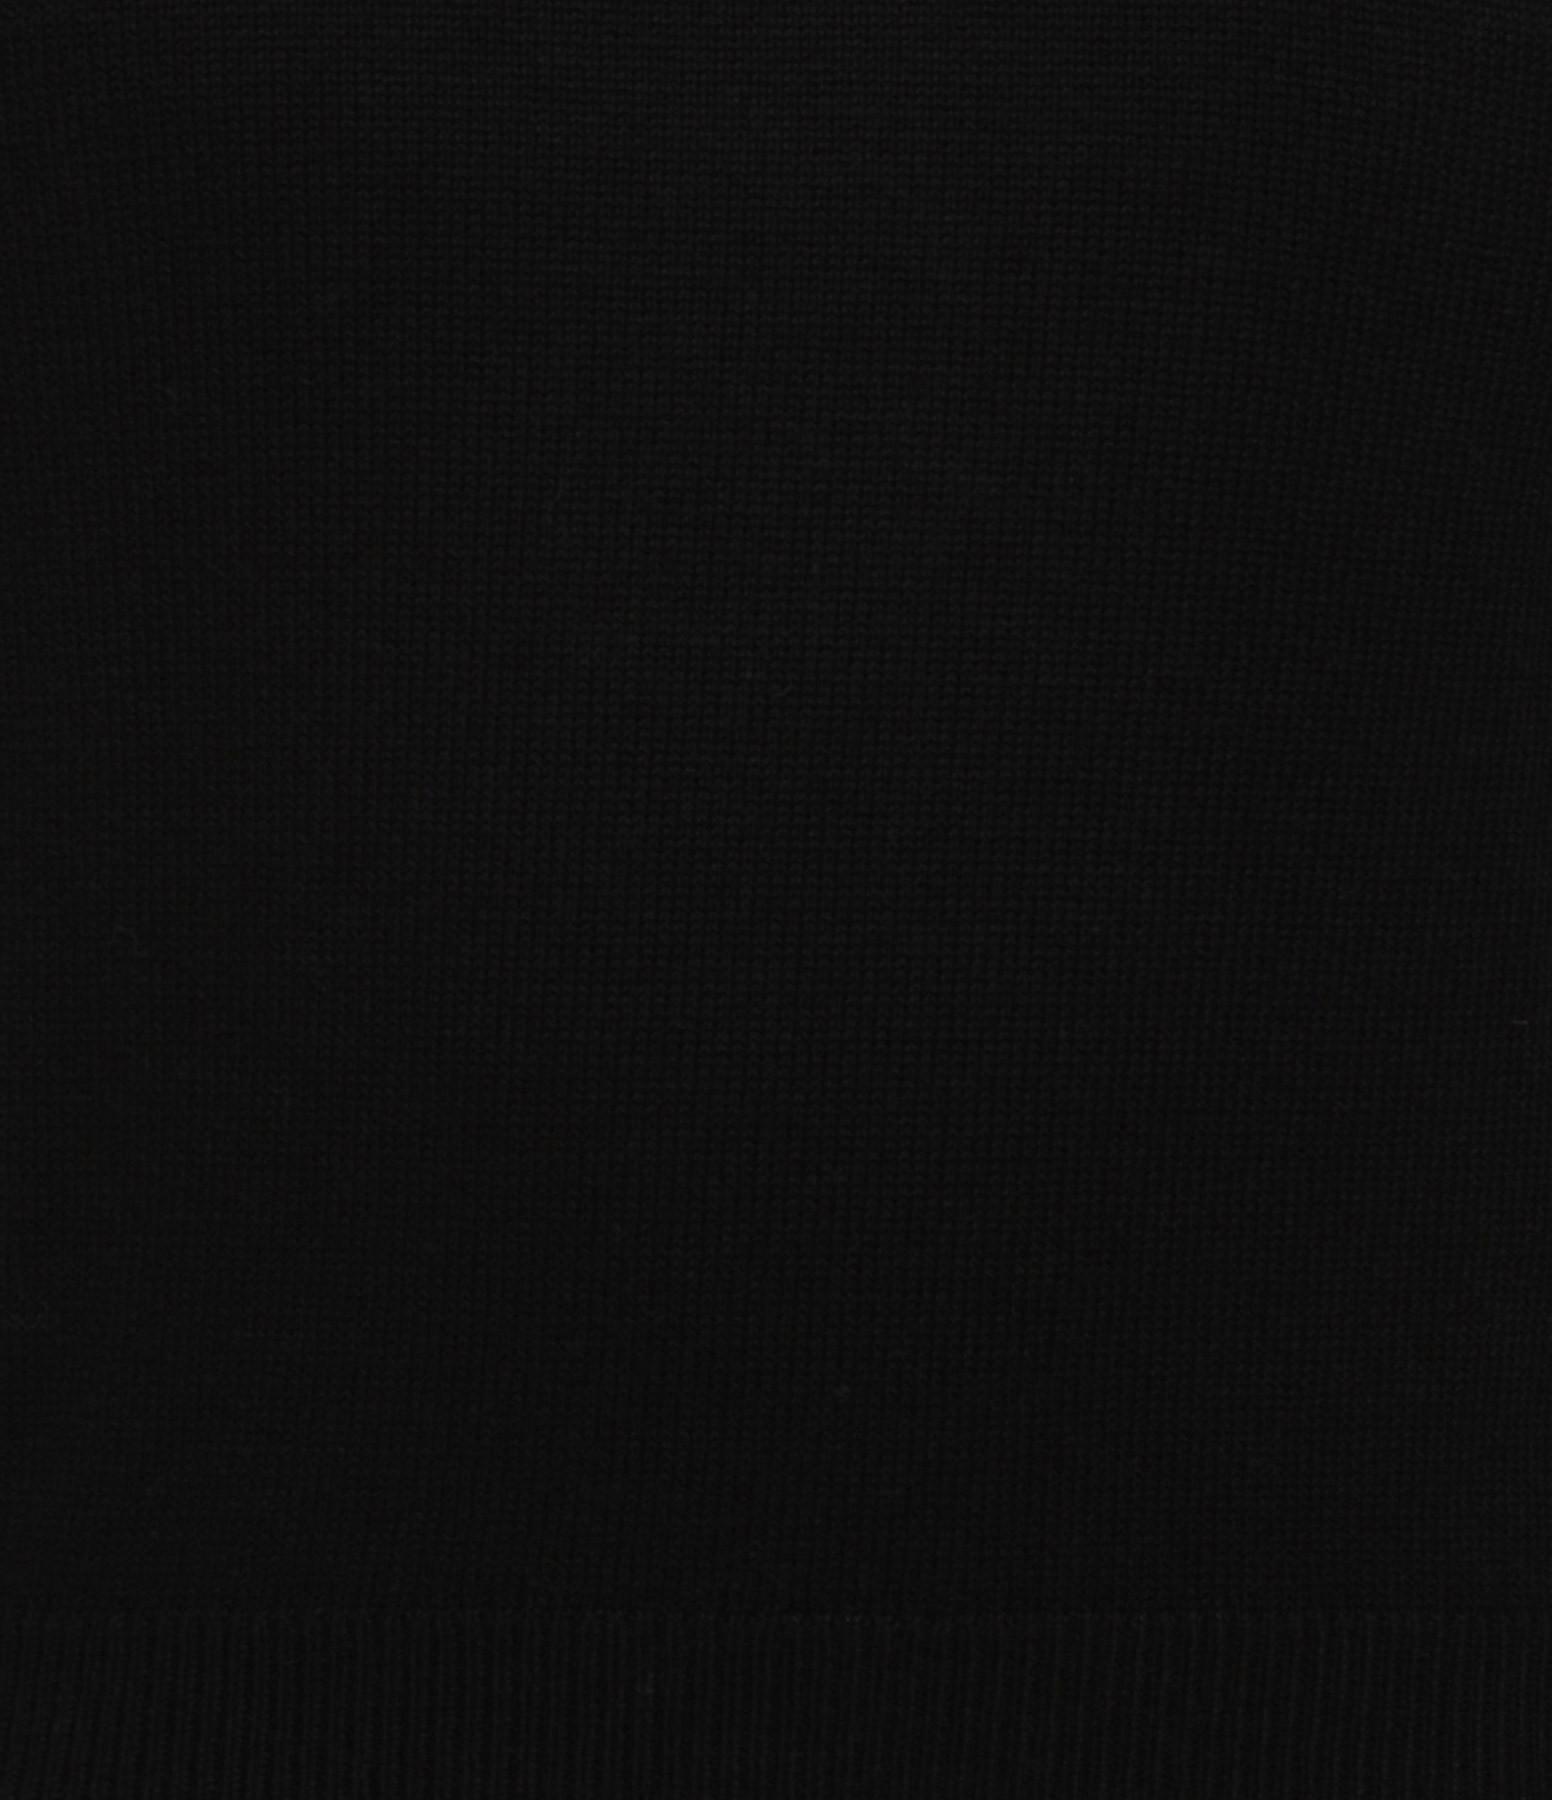 ISABEL MARANT ÉTOILE - Pull Kleely Coton Noir